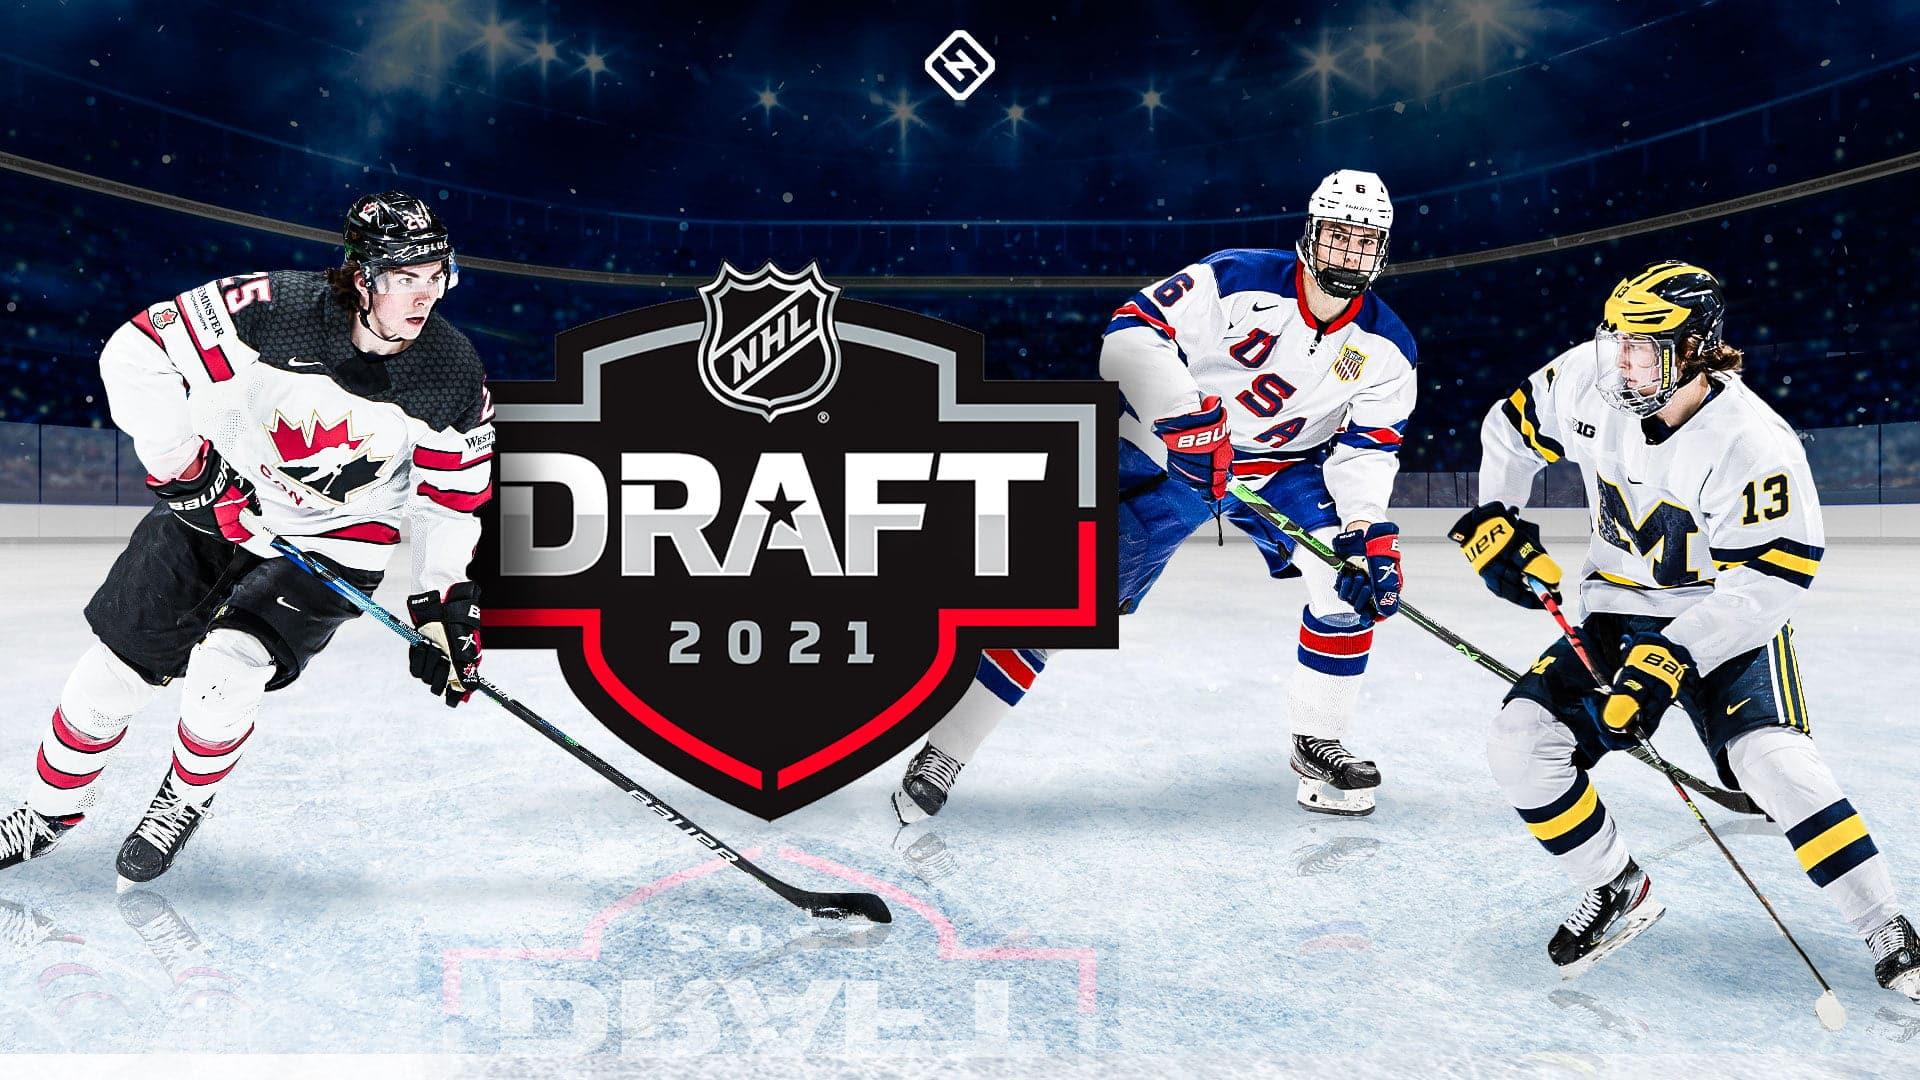 Orden del Draft de la NHL para la ronda 2021